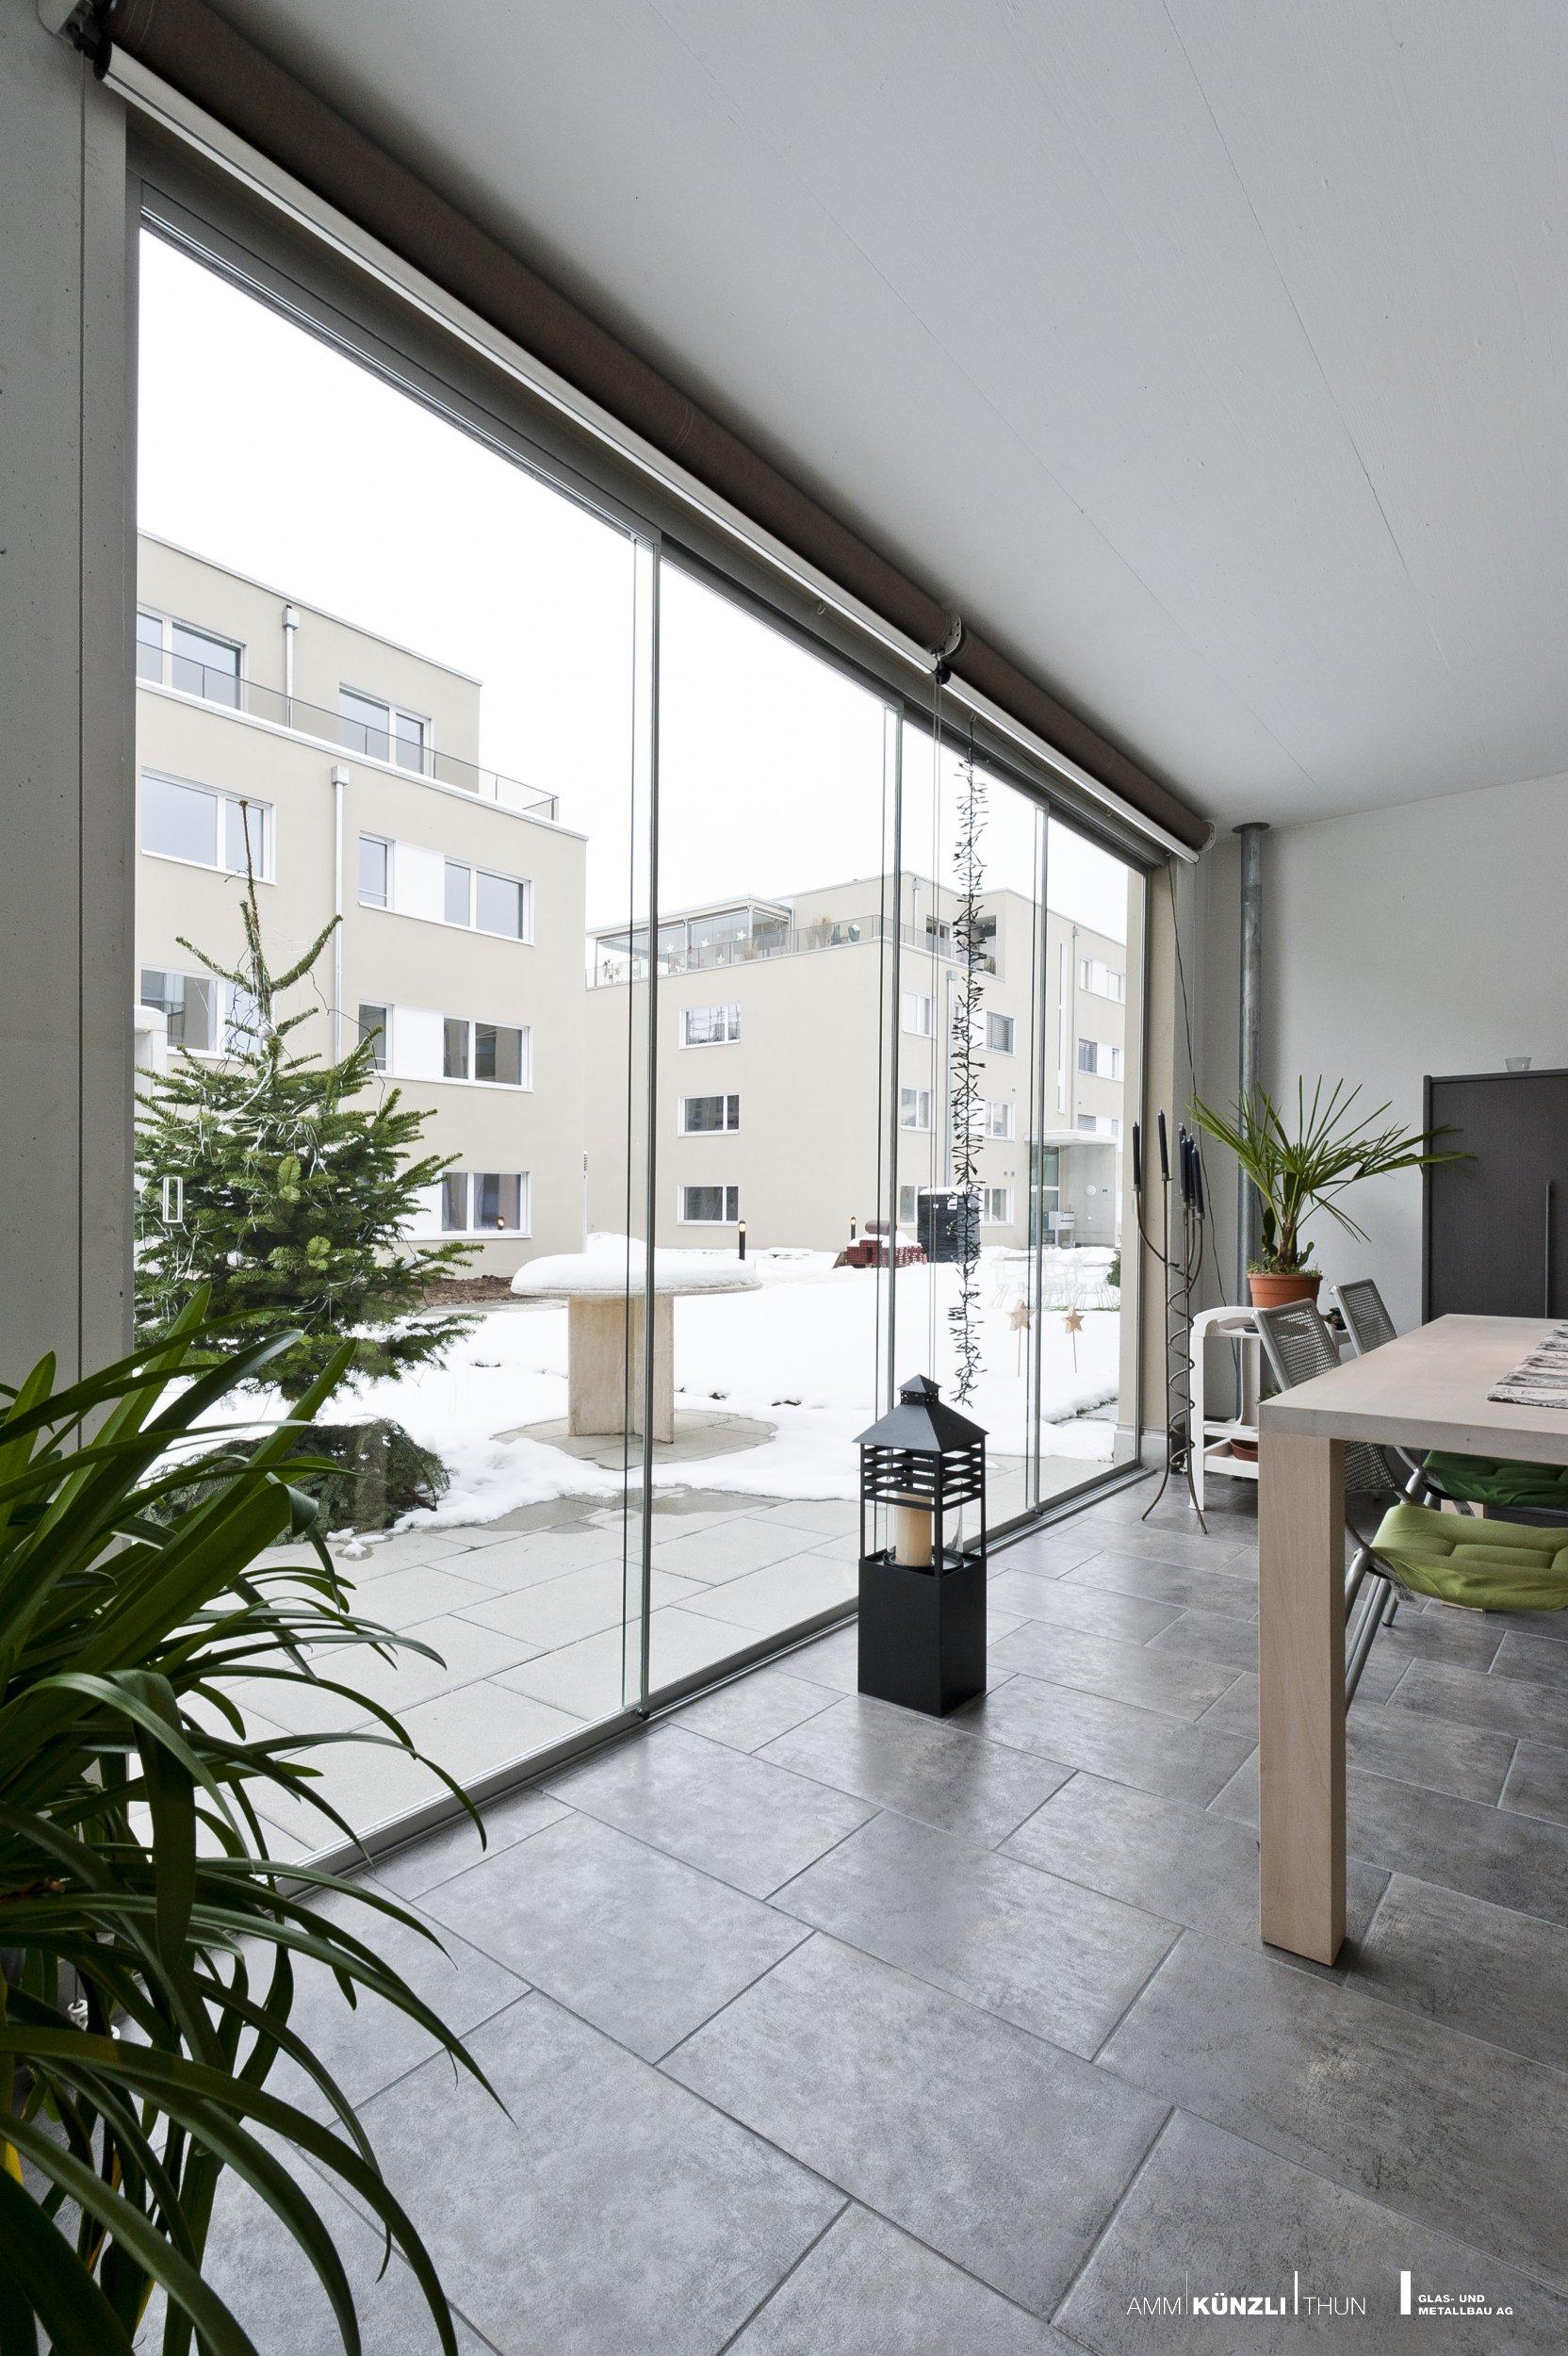 angebot balkon terrassen verglasung amm k nzli thun glas metallbau ag. Black Bedroom Furniture Sets. Home Design Ideas